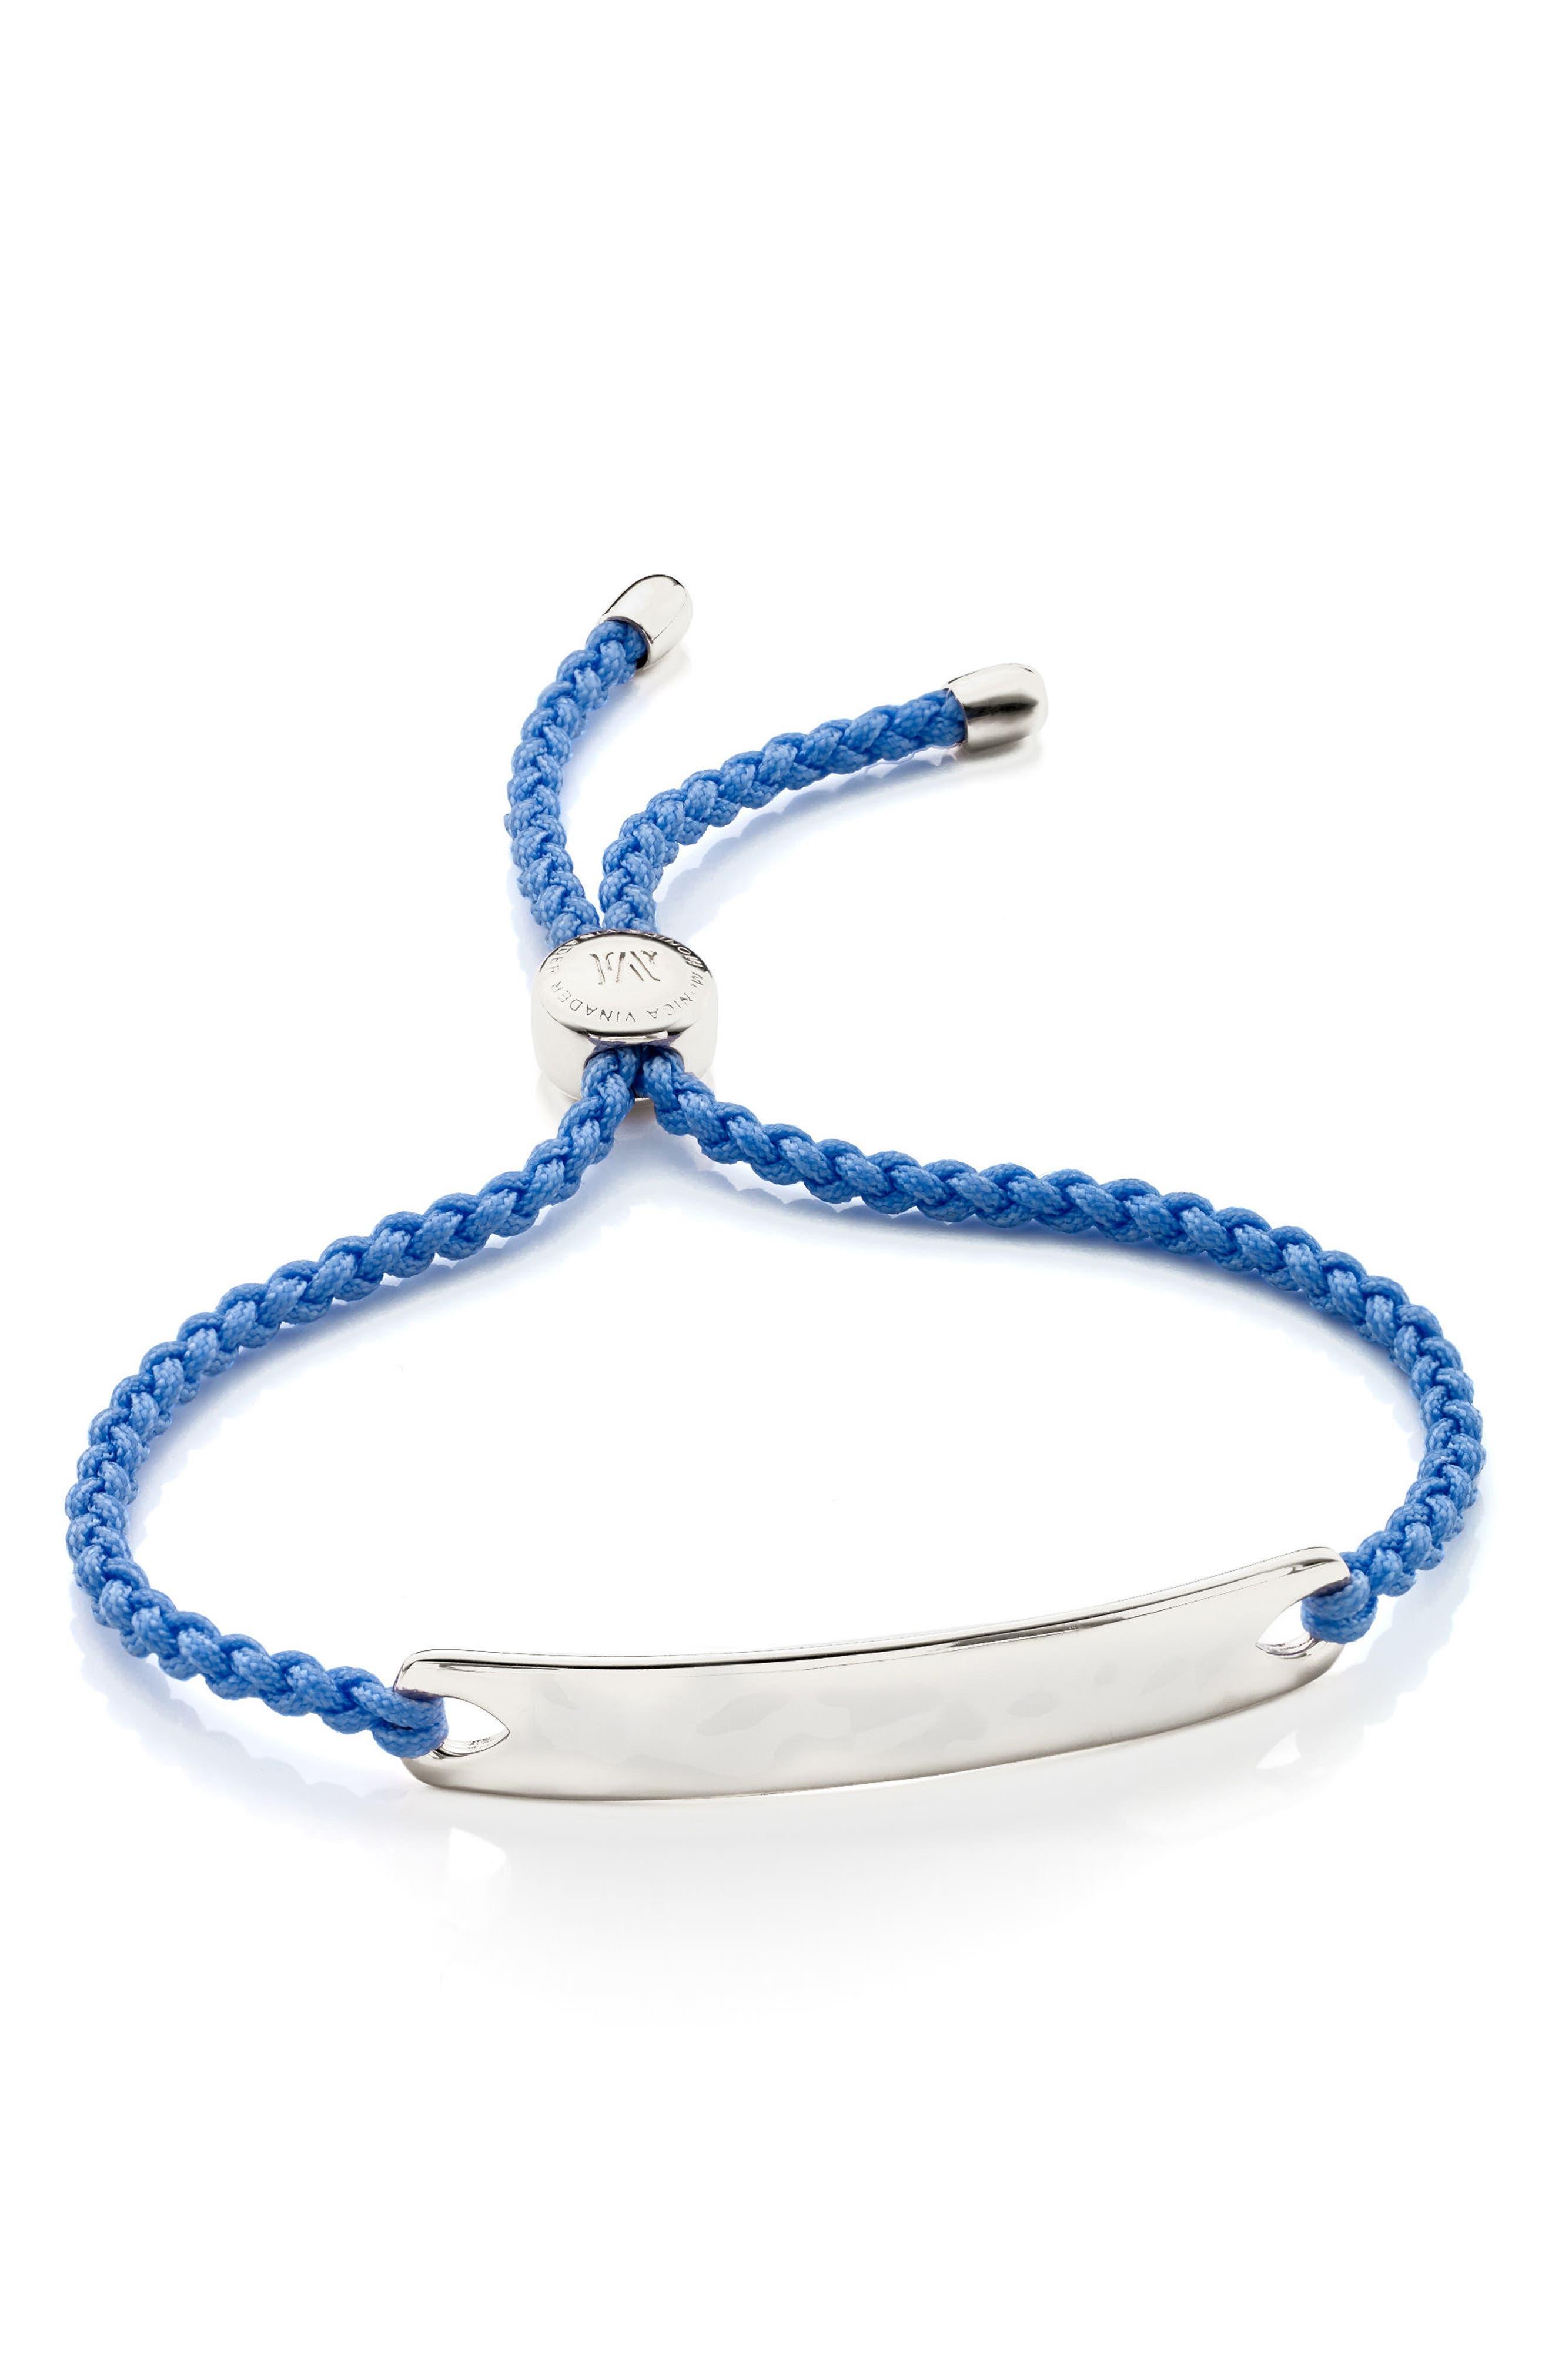 MONICA VINADER HavanaFriendship Bracelet